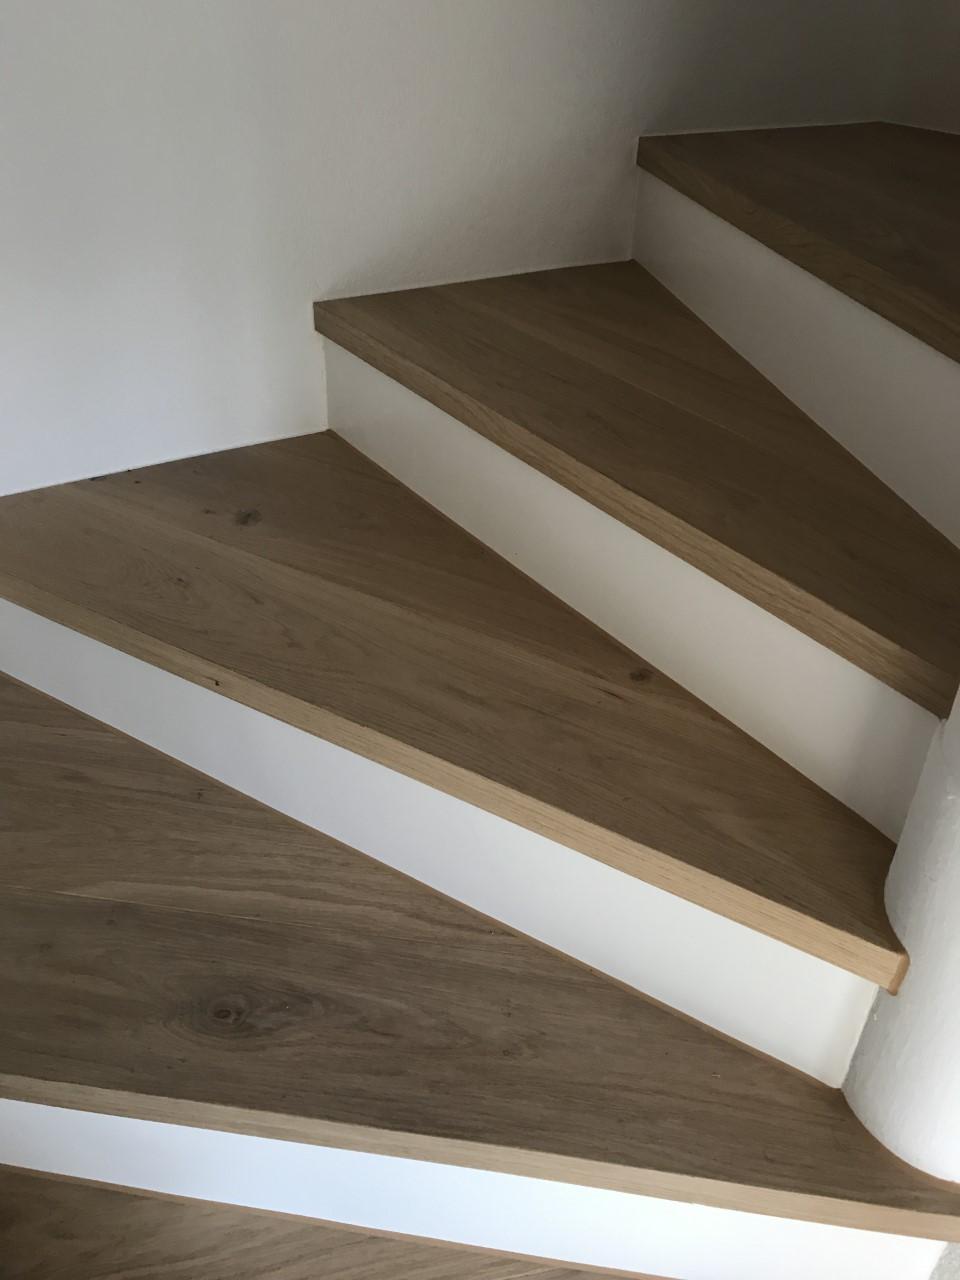 treppen belegen fabulous treppe with treppen belegen finest gallery of treppen renovierung. Black Bedroom Furniture Sets. Home Design Ideas